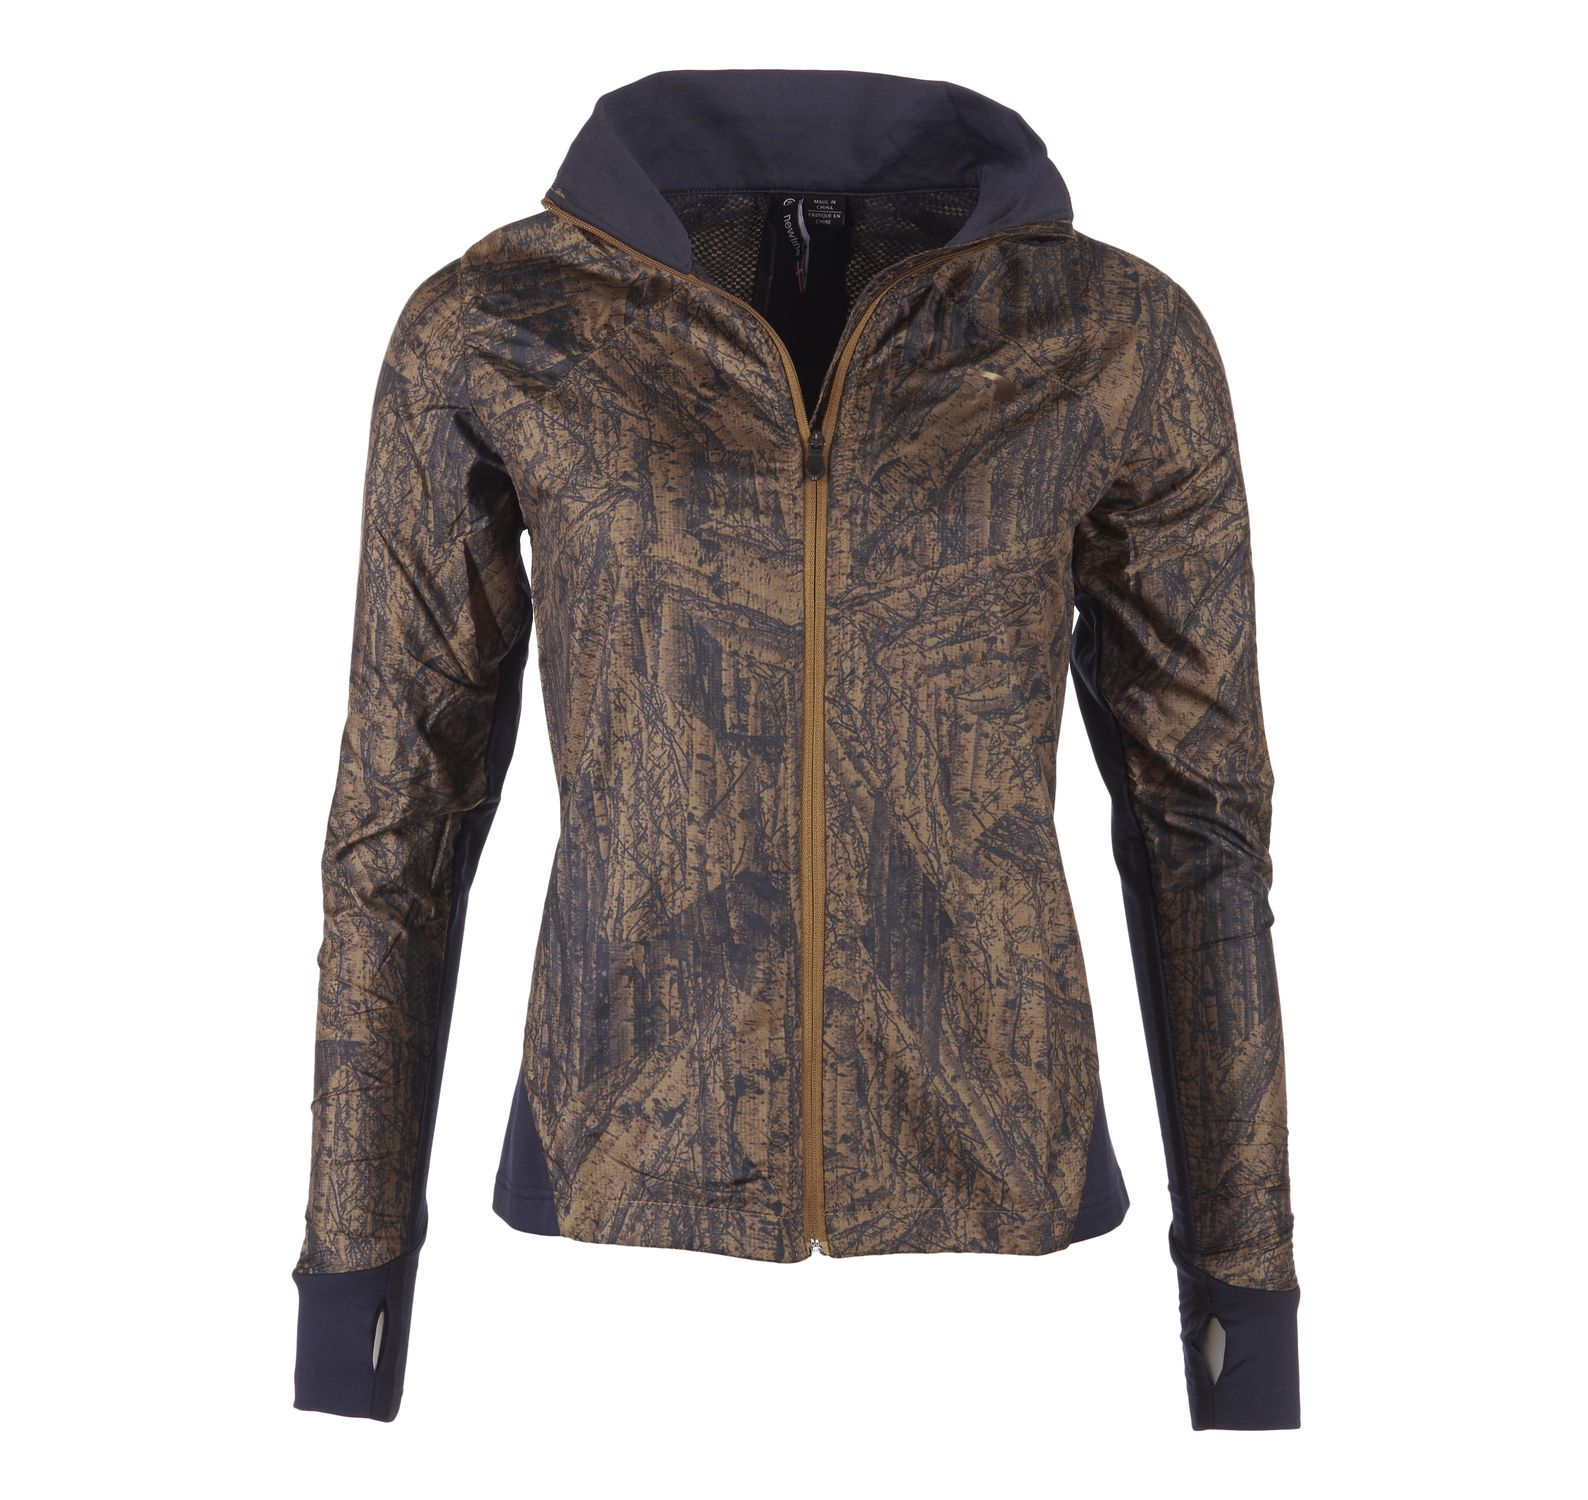 Imotion Printed Cross Jacket, Golden, Xxl